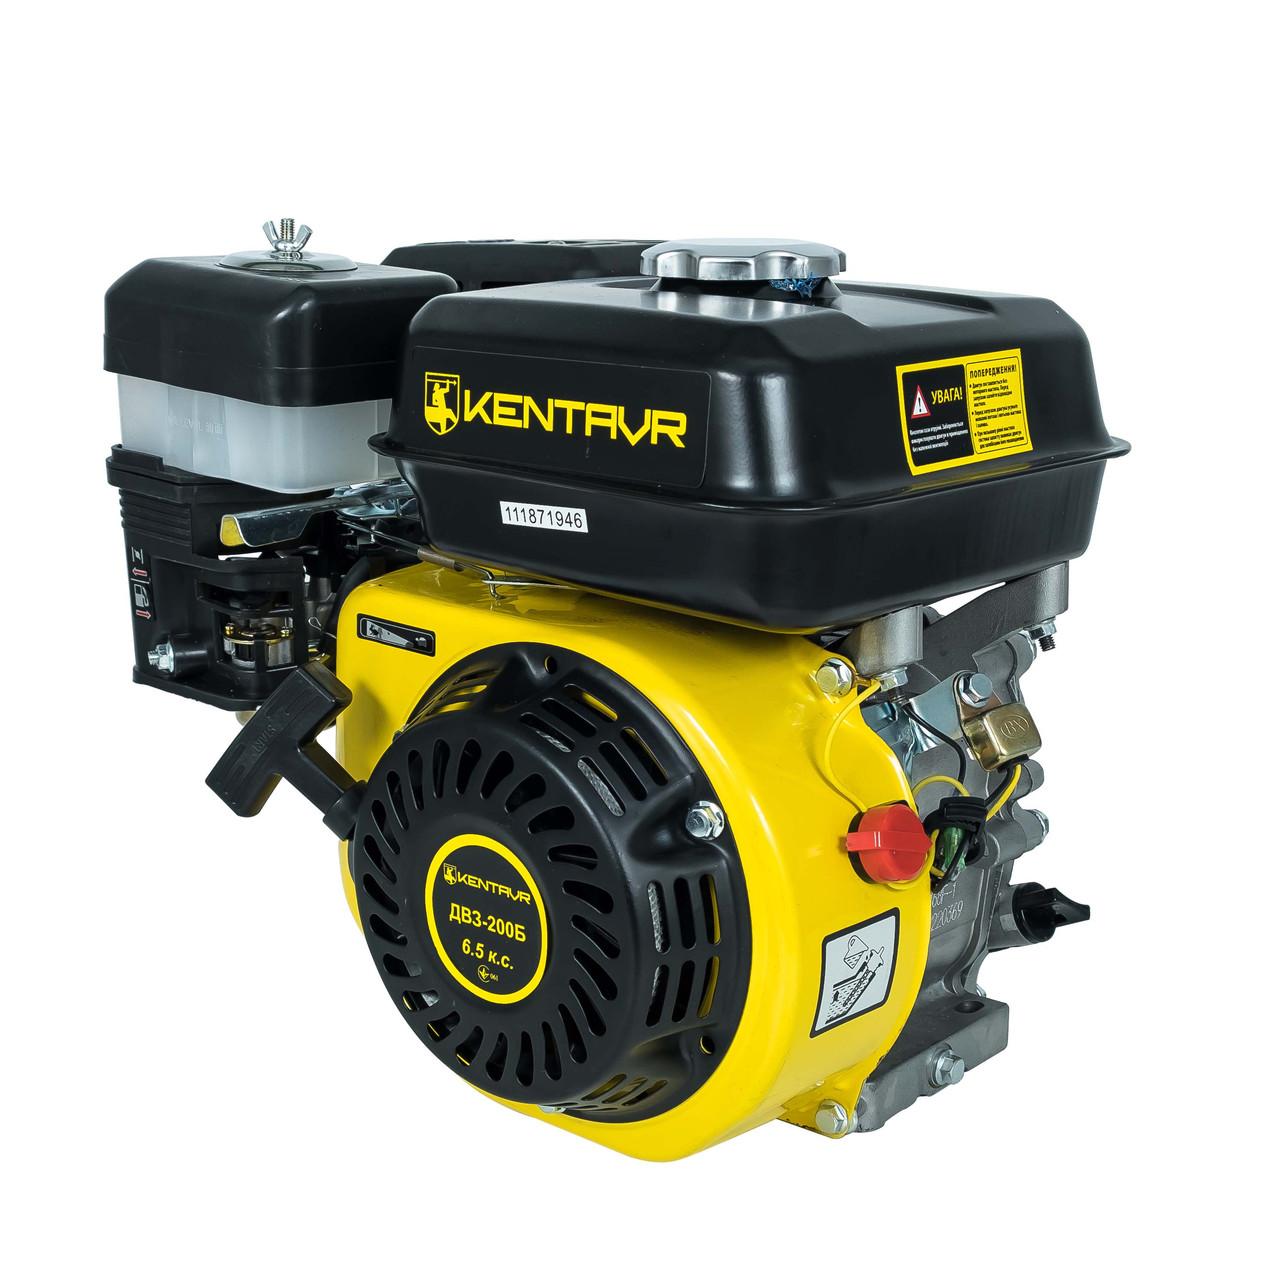 Двигатель бензиновый Кентавр ДВЗ-200Б (6,5 л.с., шпонка, вал 19мм)